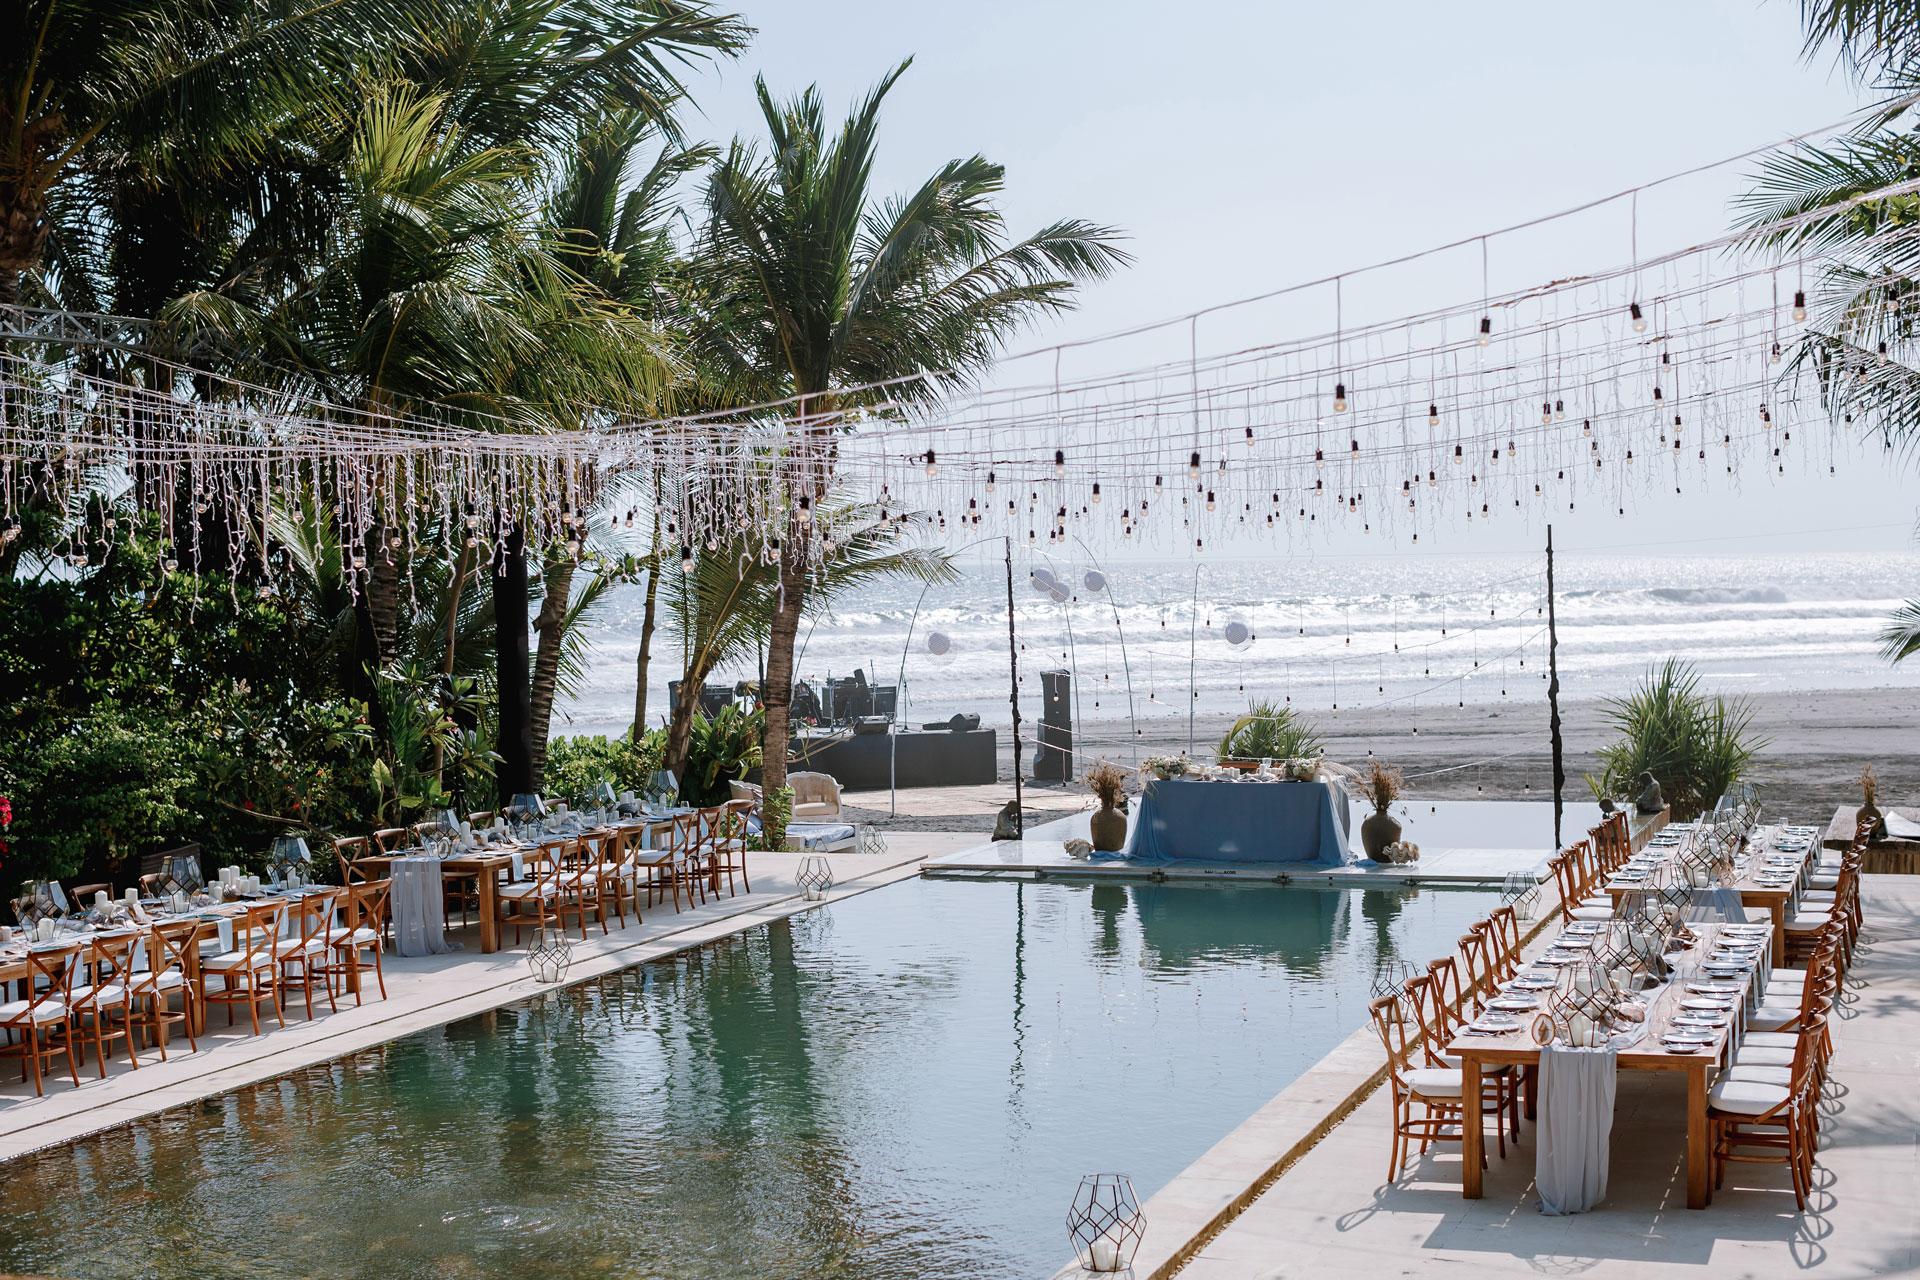 Серфинг на Бали. Свадьба Антона и Екатерины фото 8